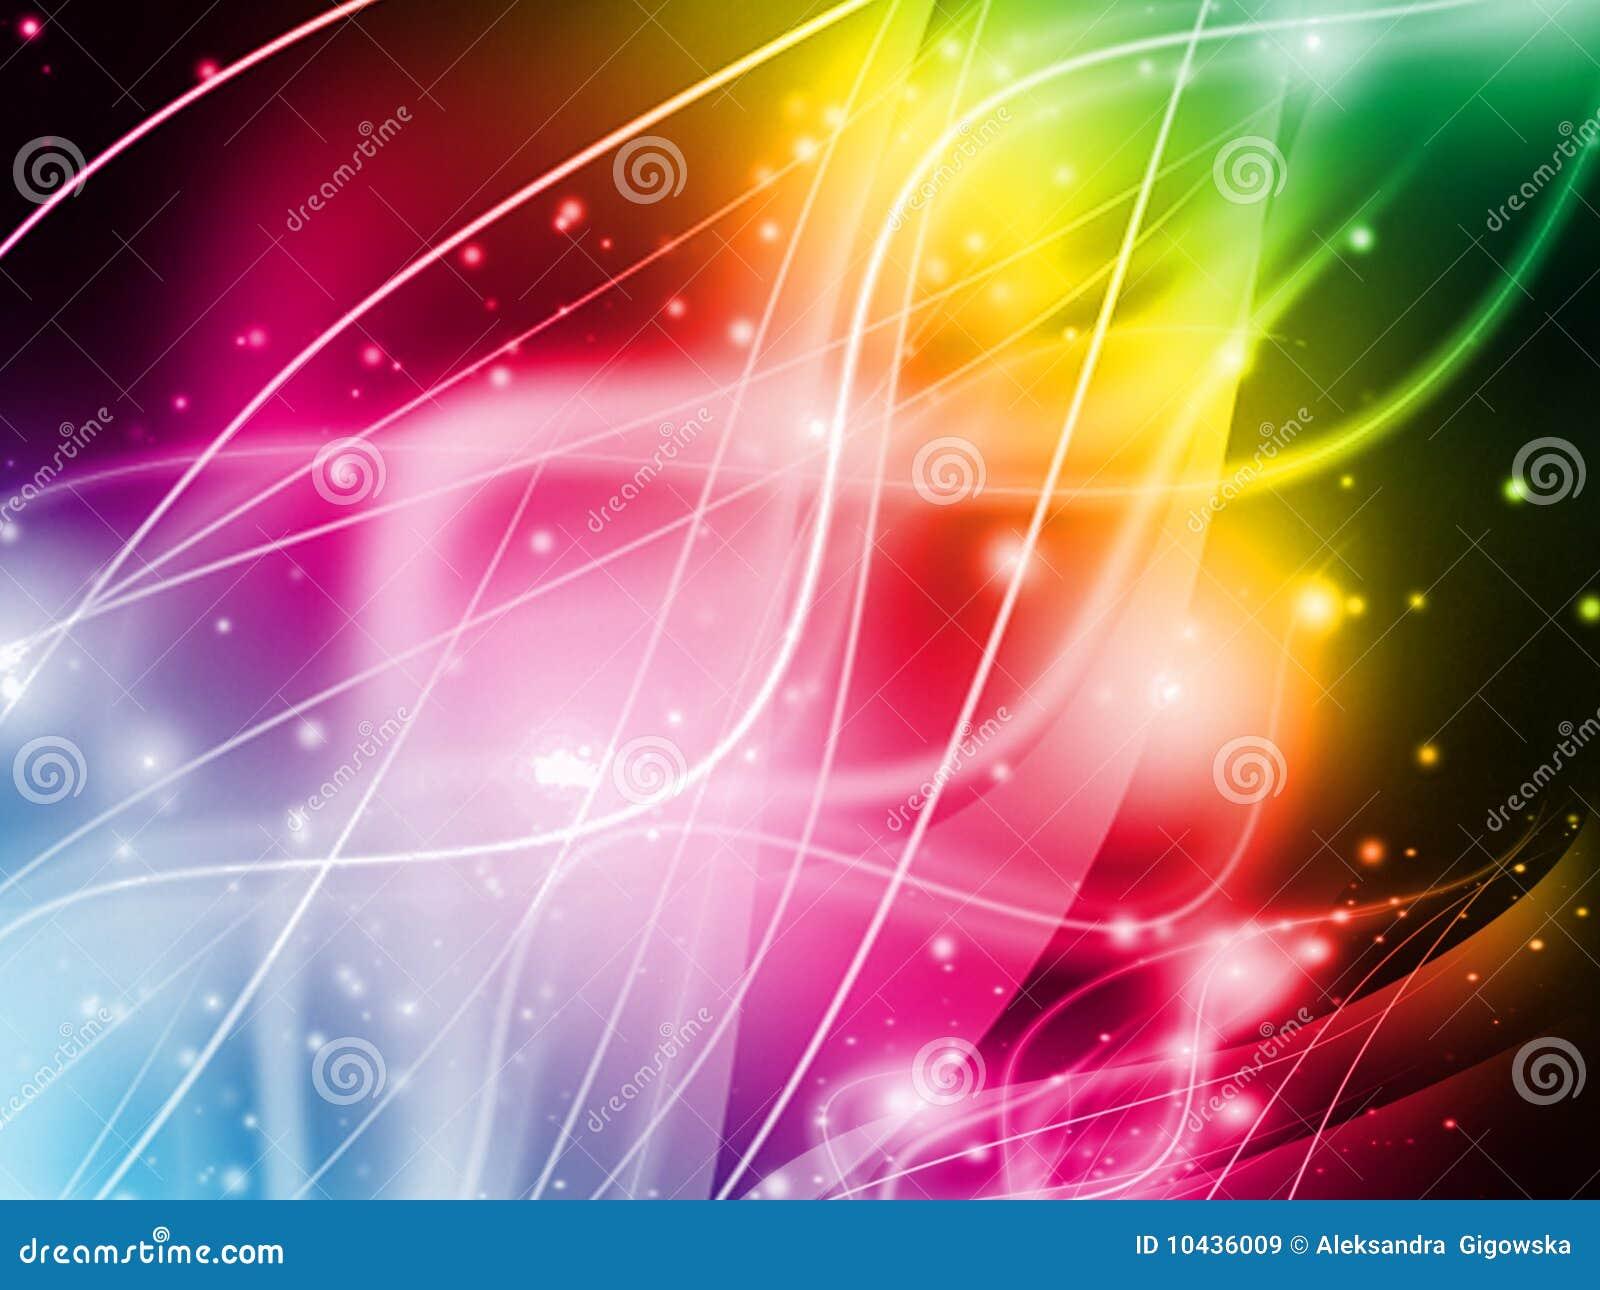 lumire colore de fond abstrait - Lumire Colore